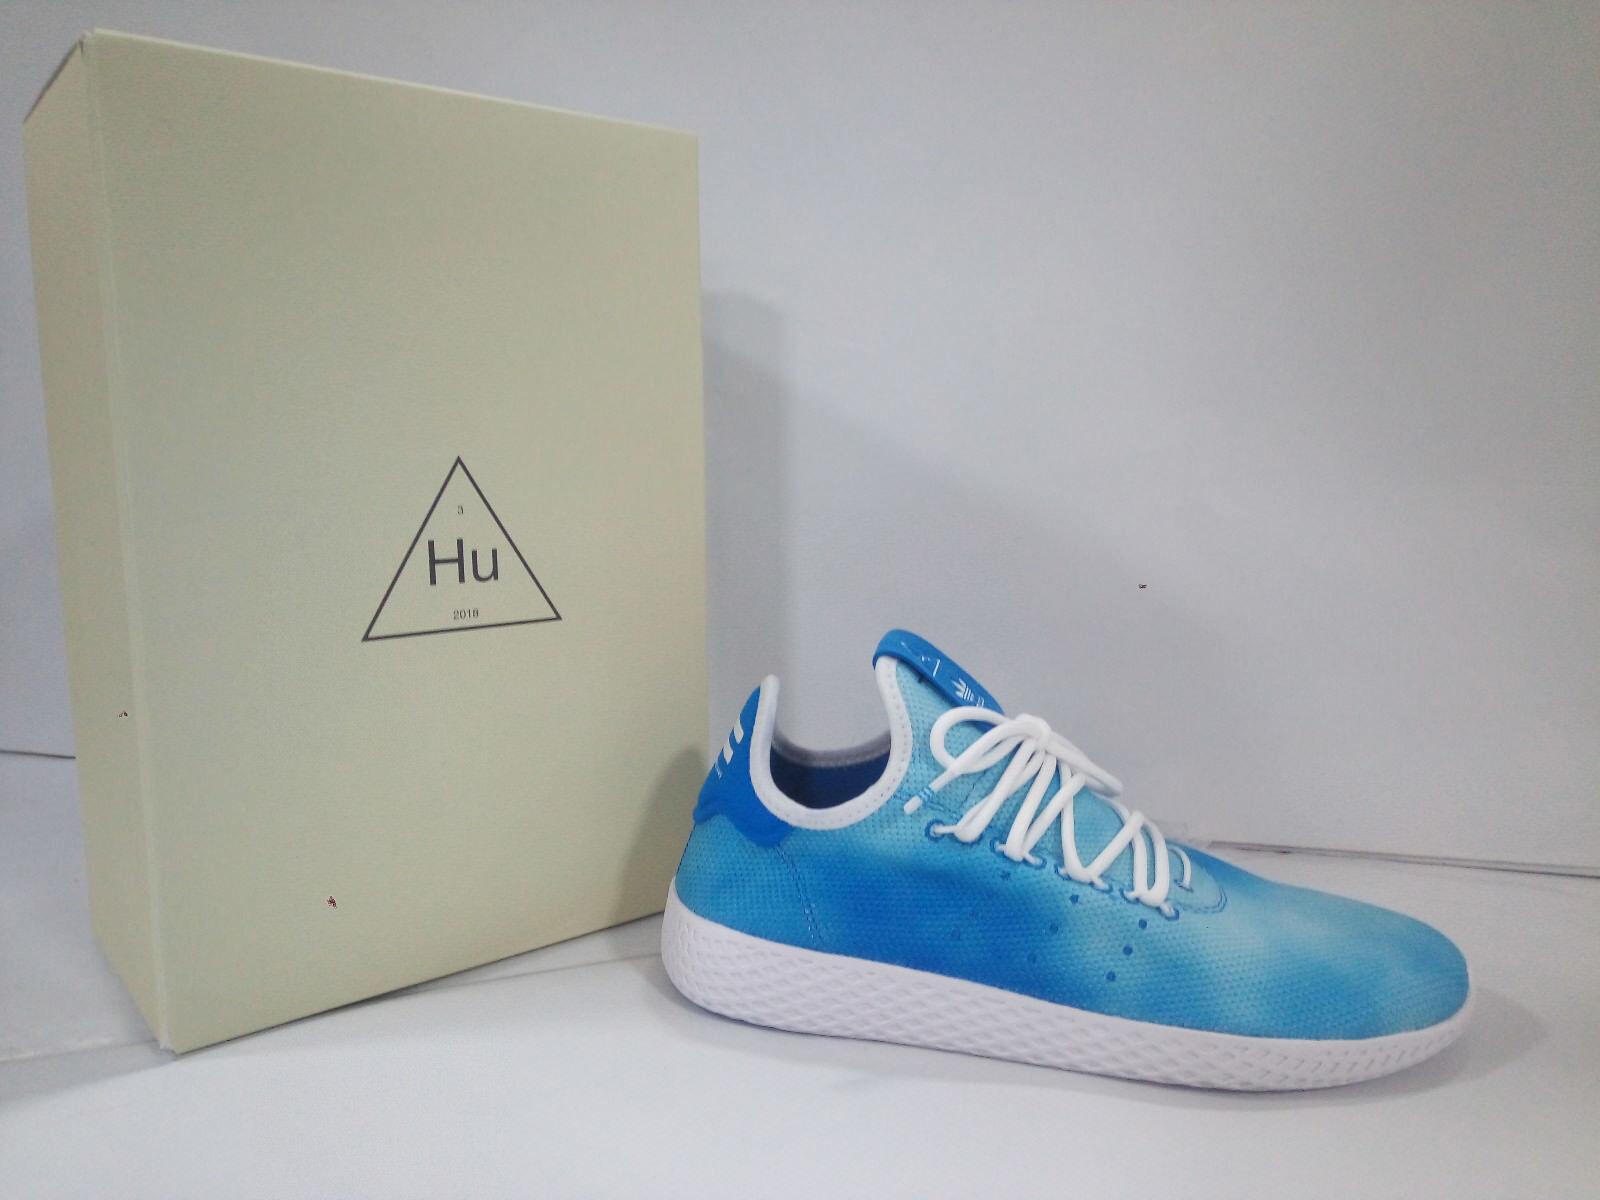 Zapatos  Adidas hombre  Pharrell Williams Azzurro Hu Holi Tennis  Azzurro Williams Bianco  DA9618 44a848